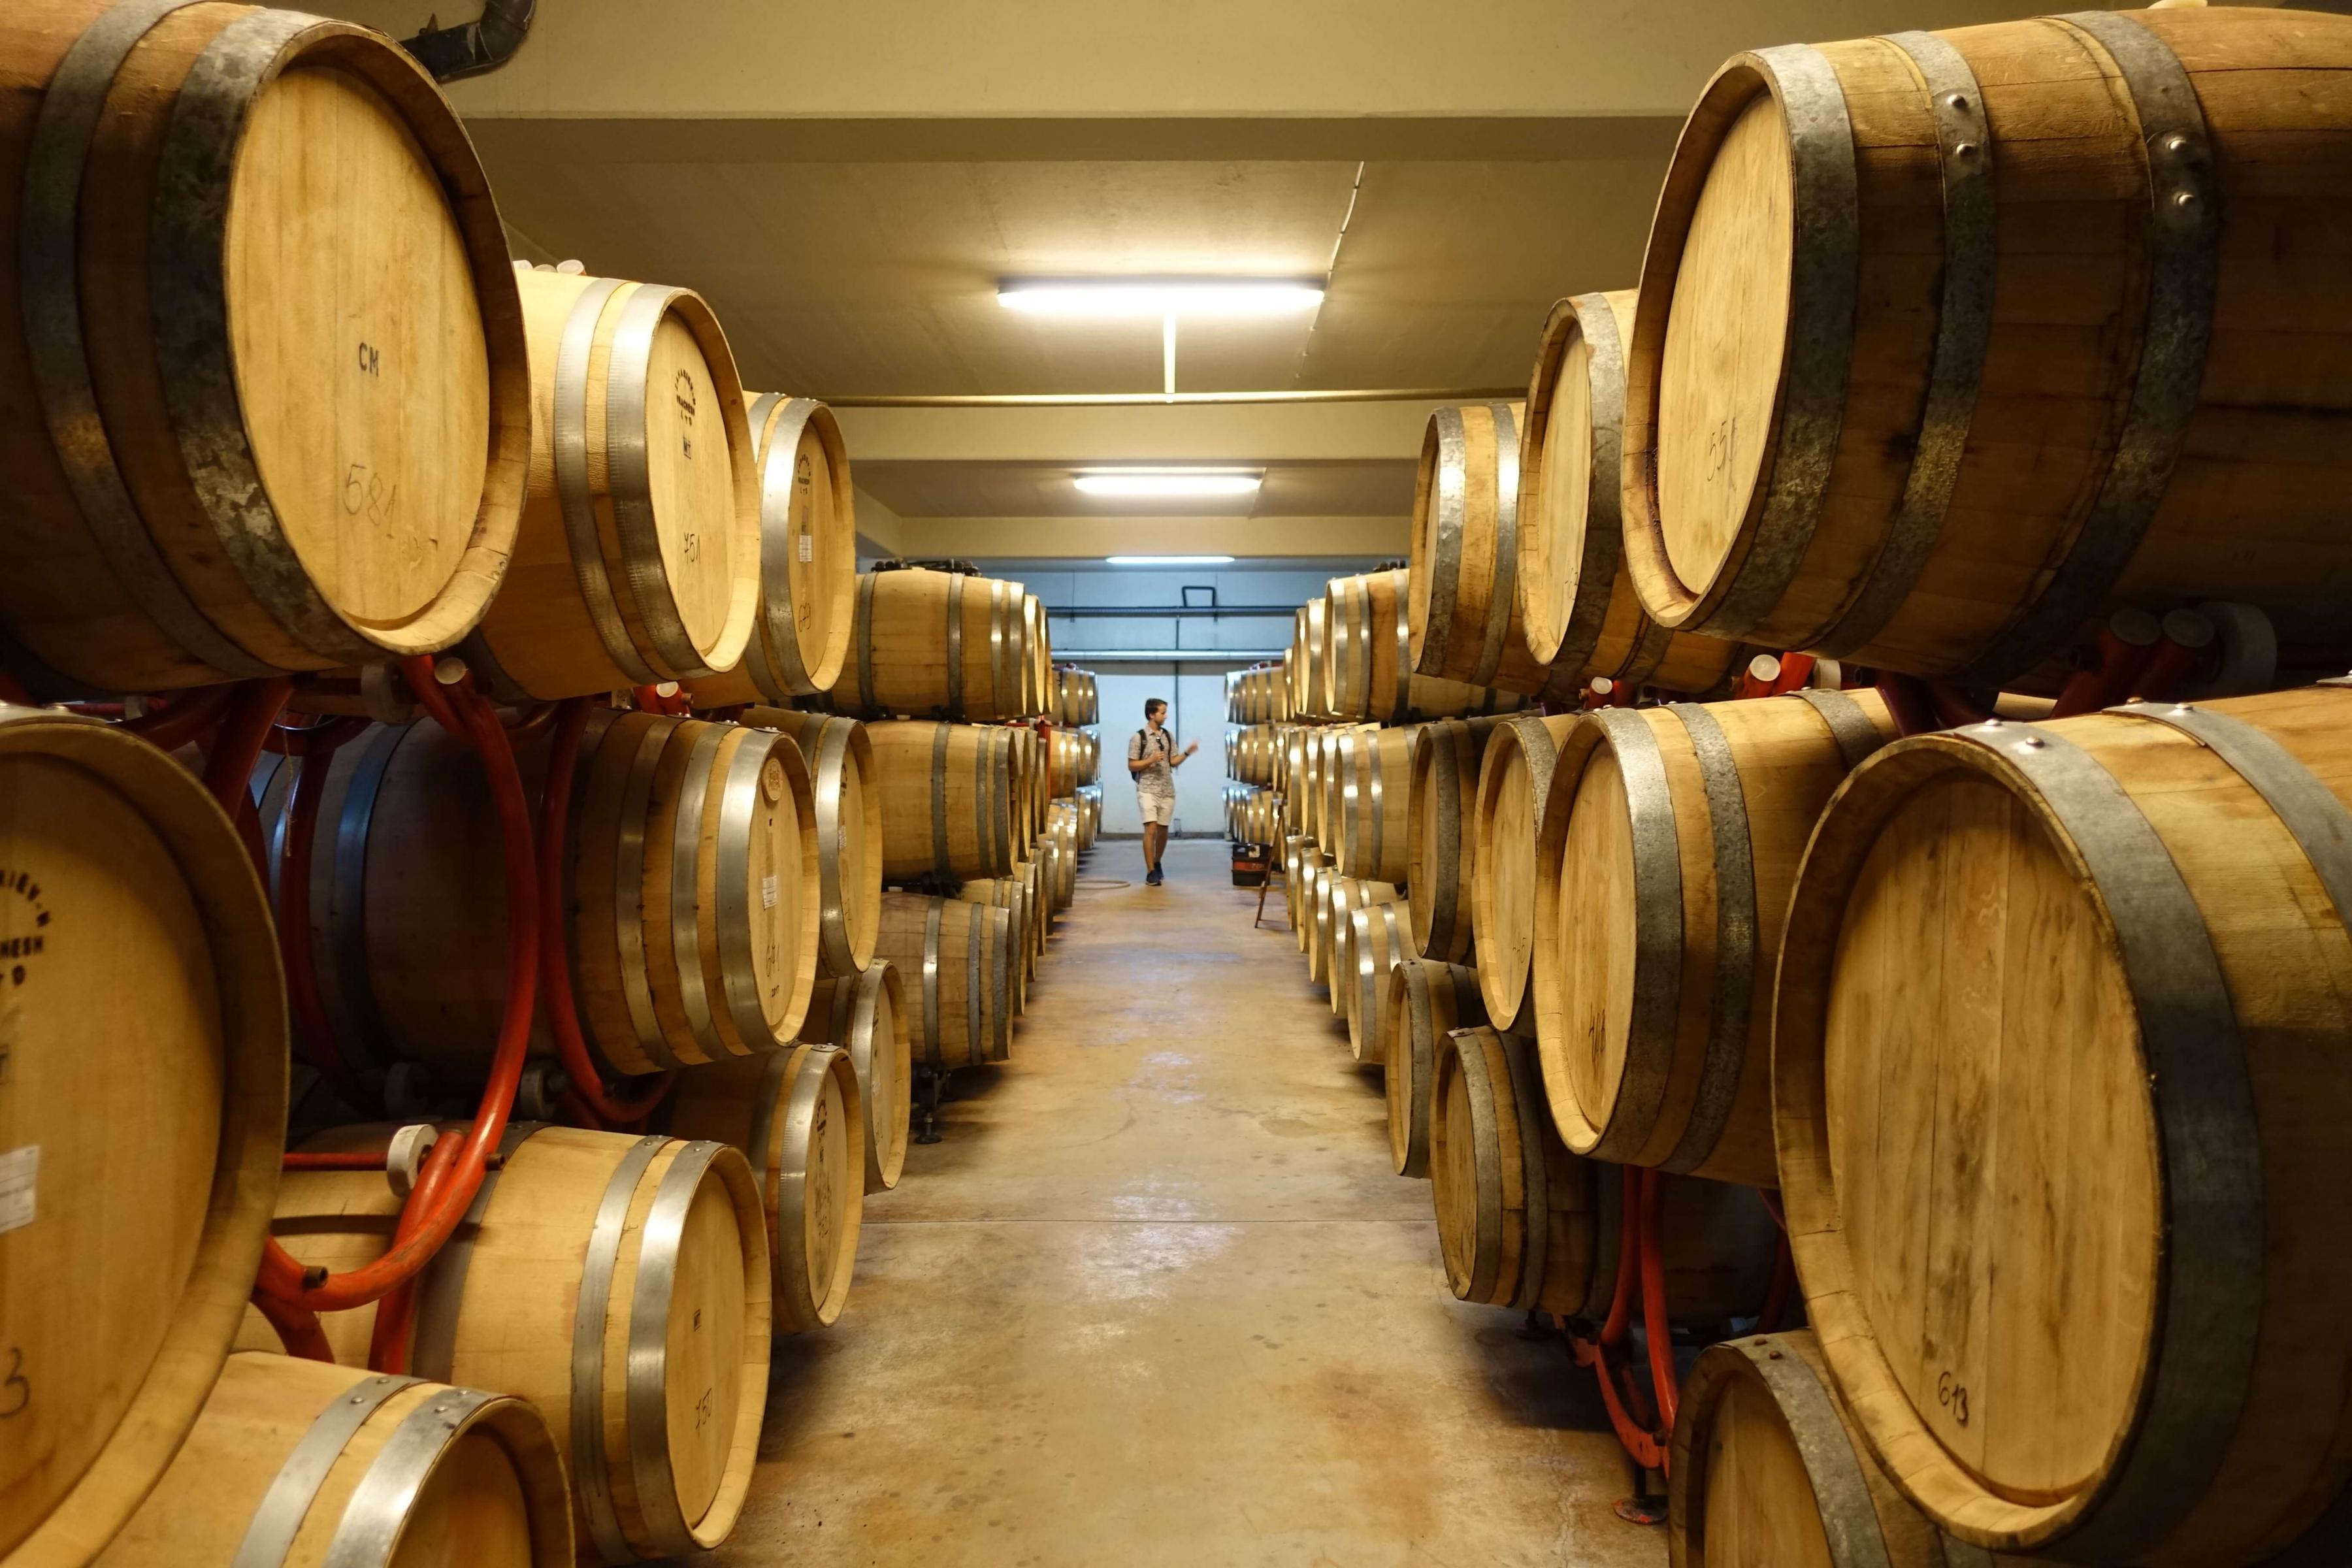 Bulgaria Wine Tours: Day Wine Tour from Sofia